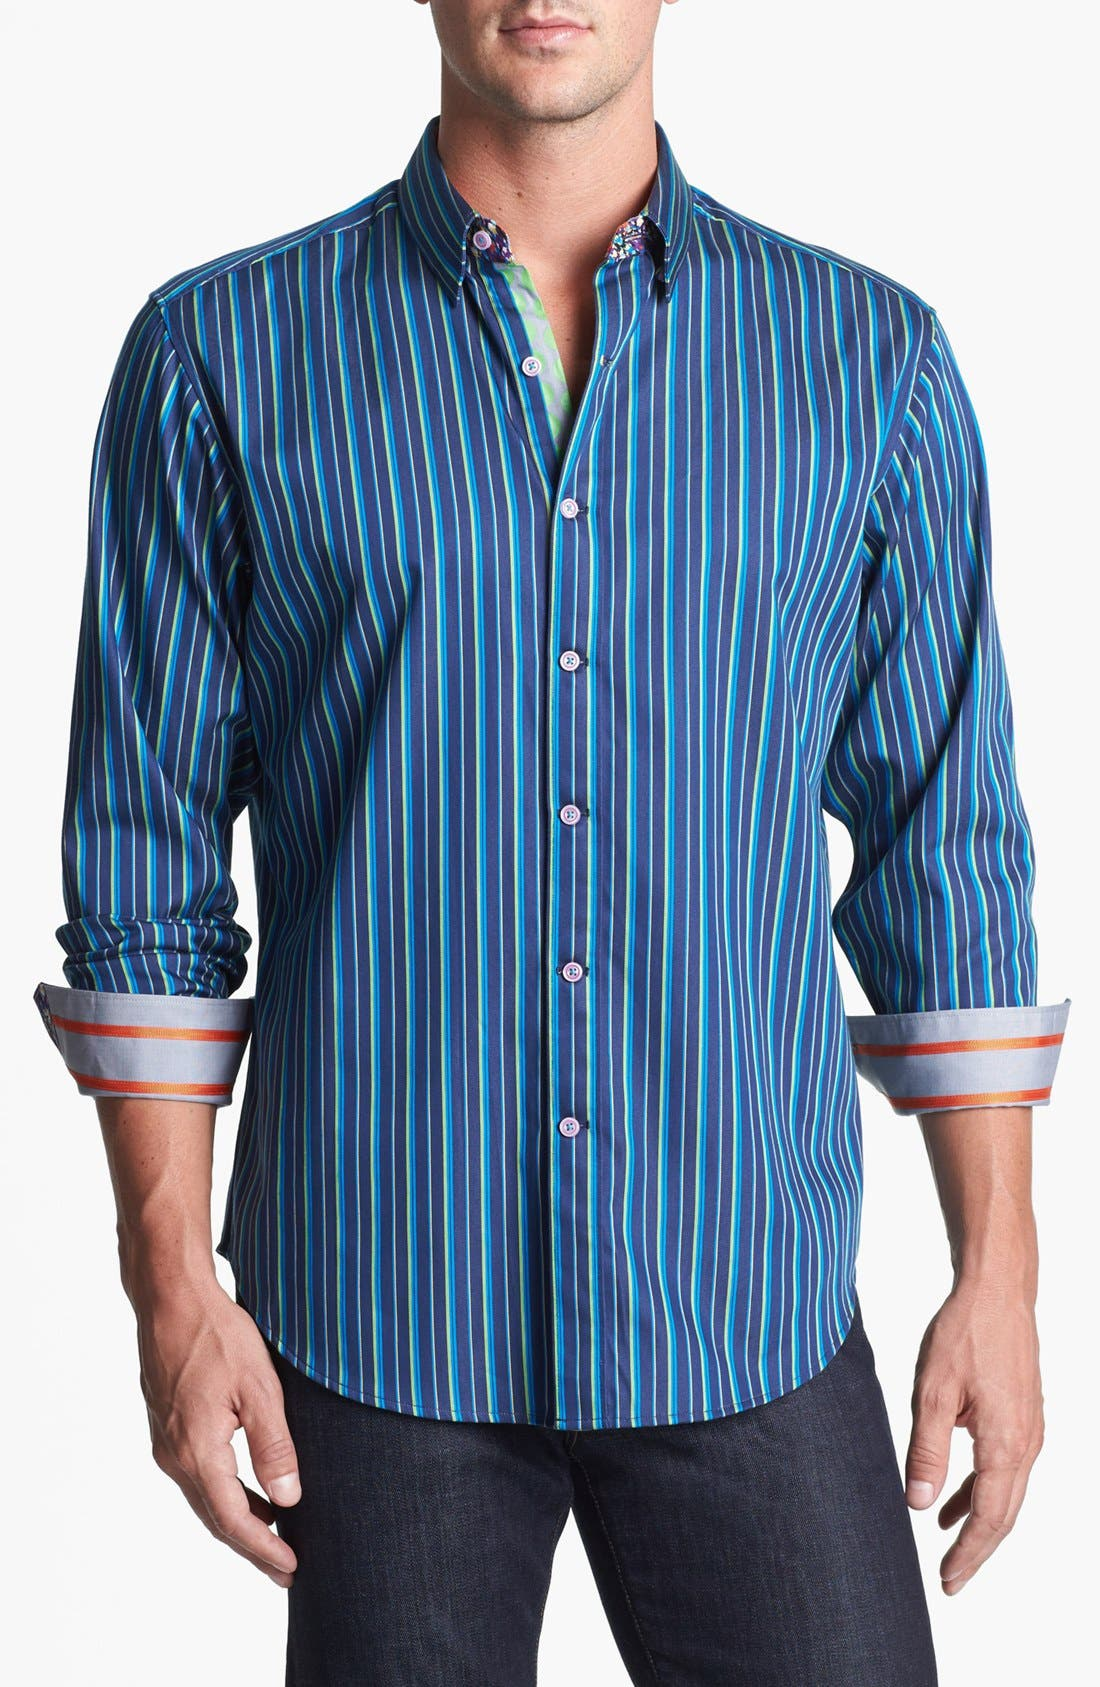 Alternate Image 1 Selected - Robert Graham 'Skimmer' Tailored Fit Sport Shirt